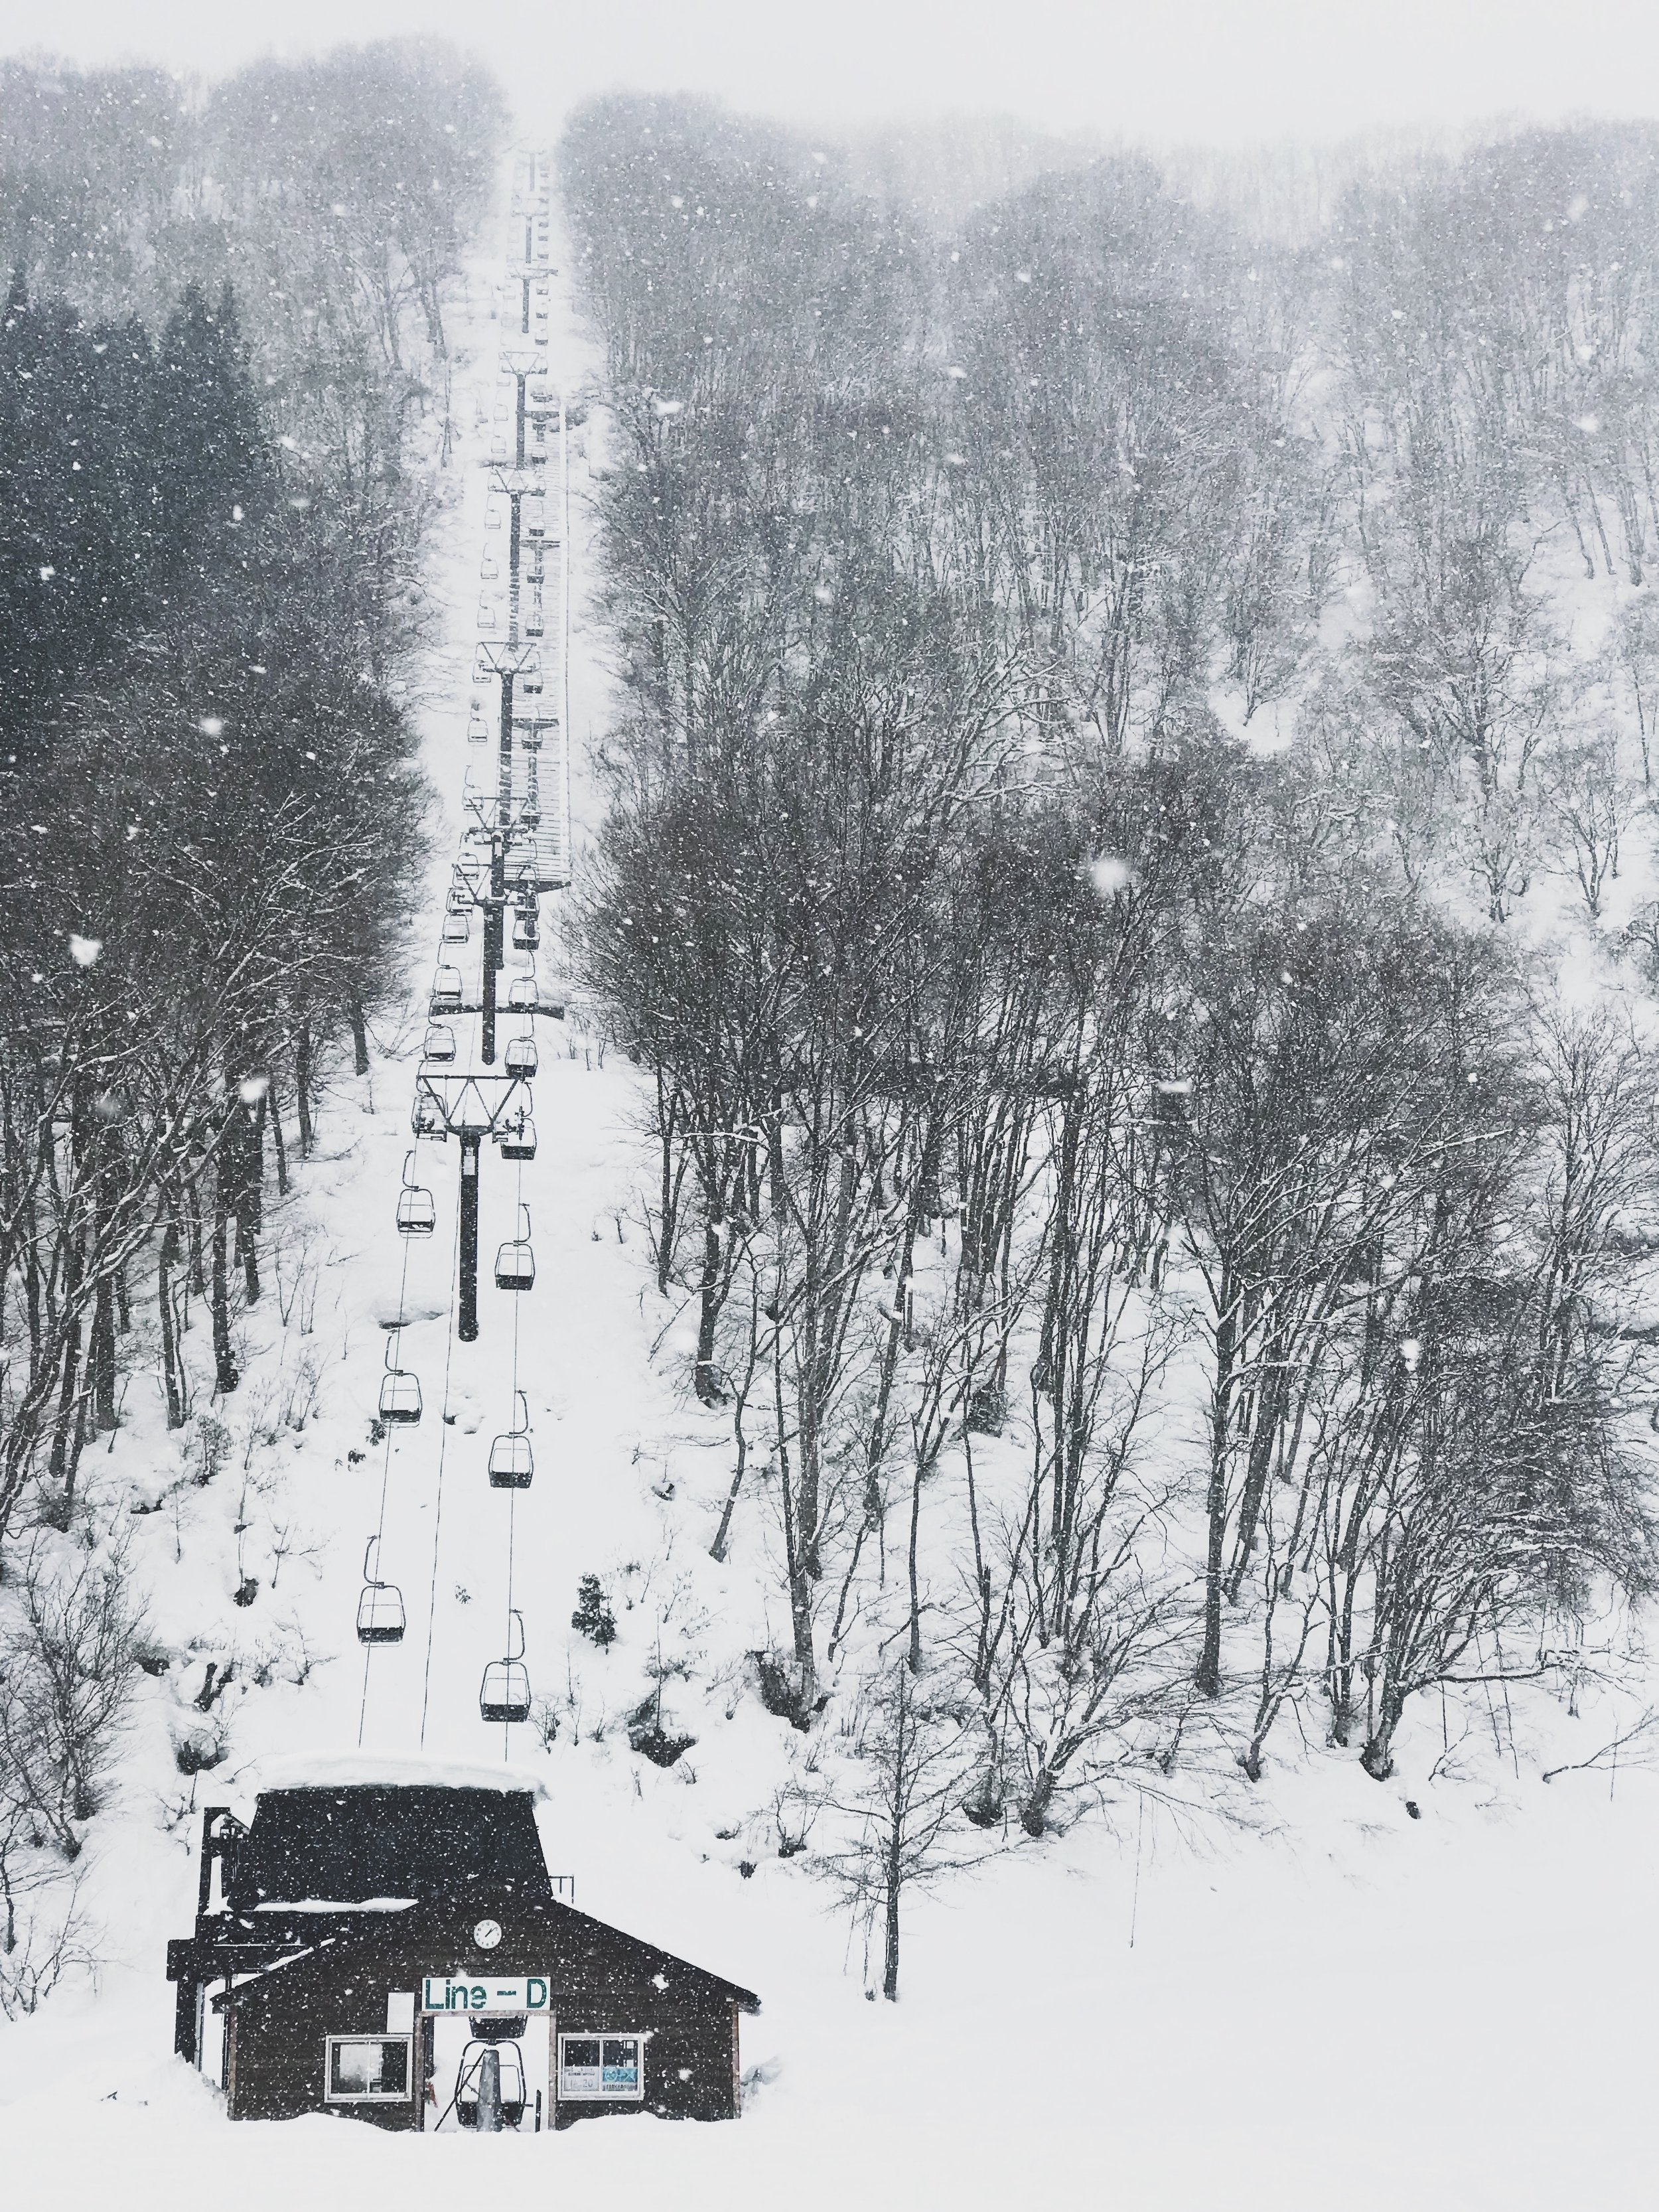 Nagano, Japan (2019)